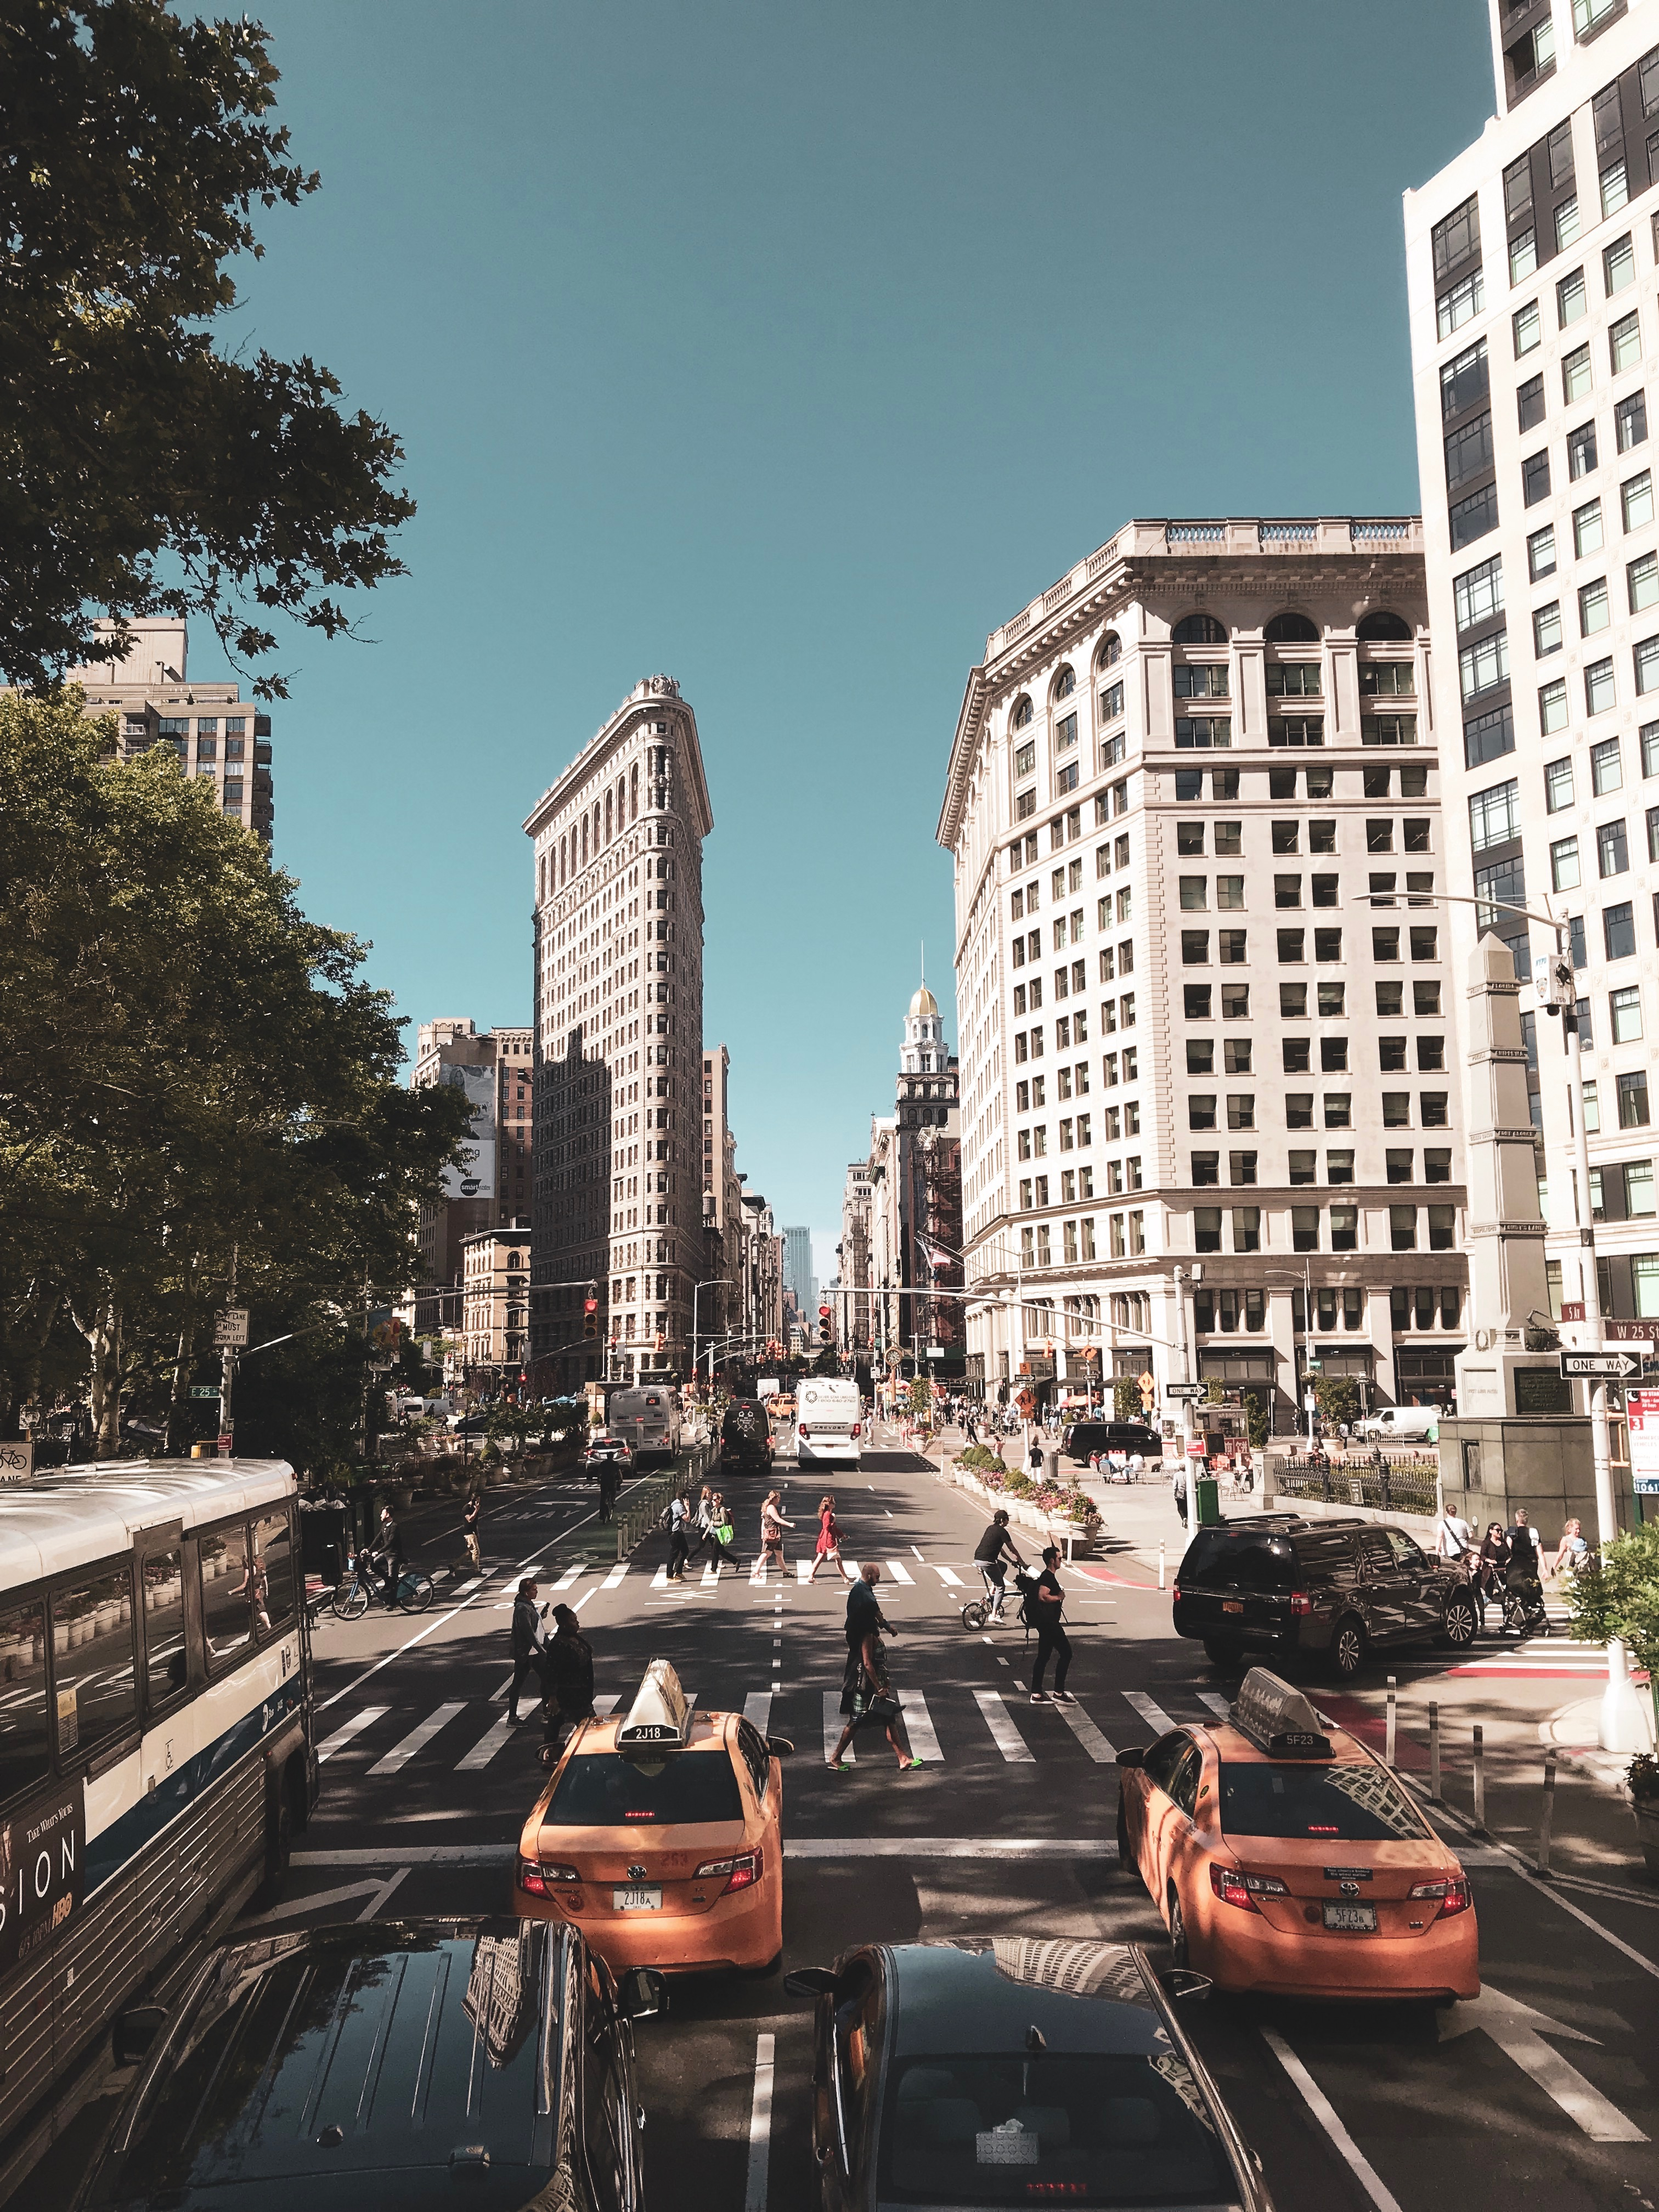 viaggio-a-new-york-manhattan-flatiron-building